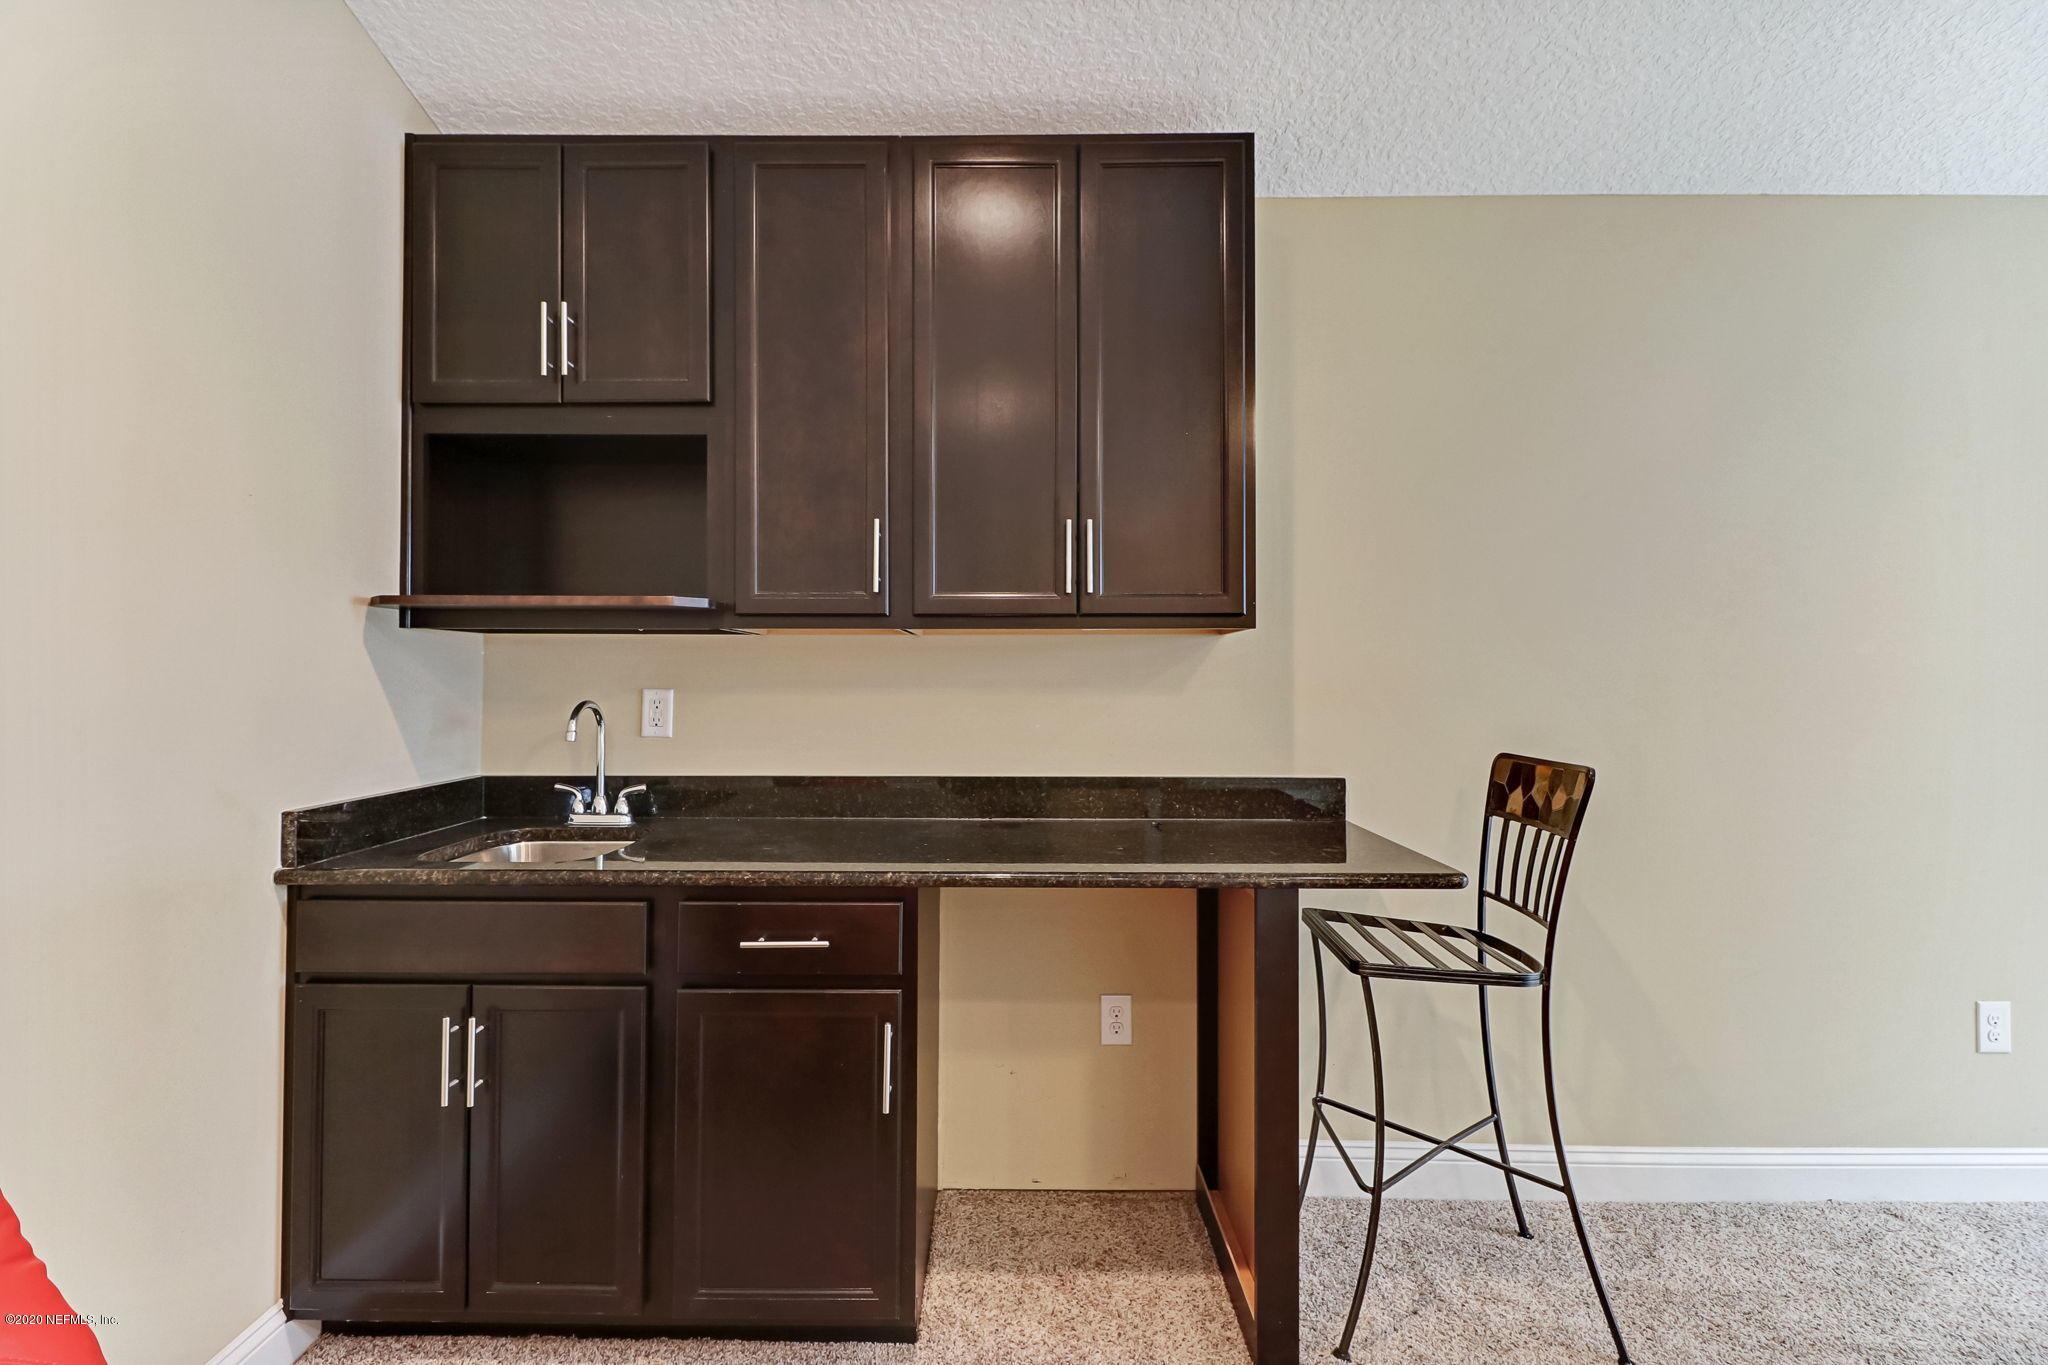 2800 SEA GRAPE, FERNANDINA BEACH, FLORIDA 32034, 5 Bedrooms Bedrooms, ,4 BathroomsBathrooms,Residential,For sale,SEA GRAPE,1081323